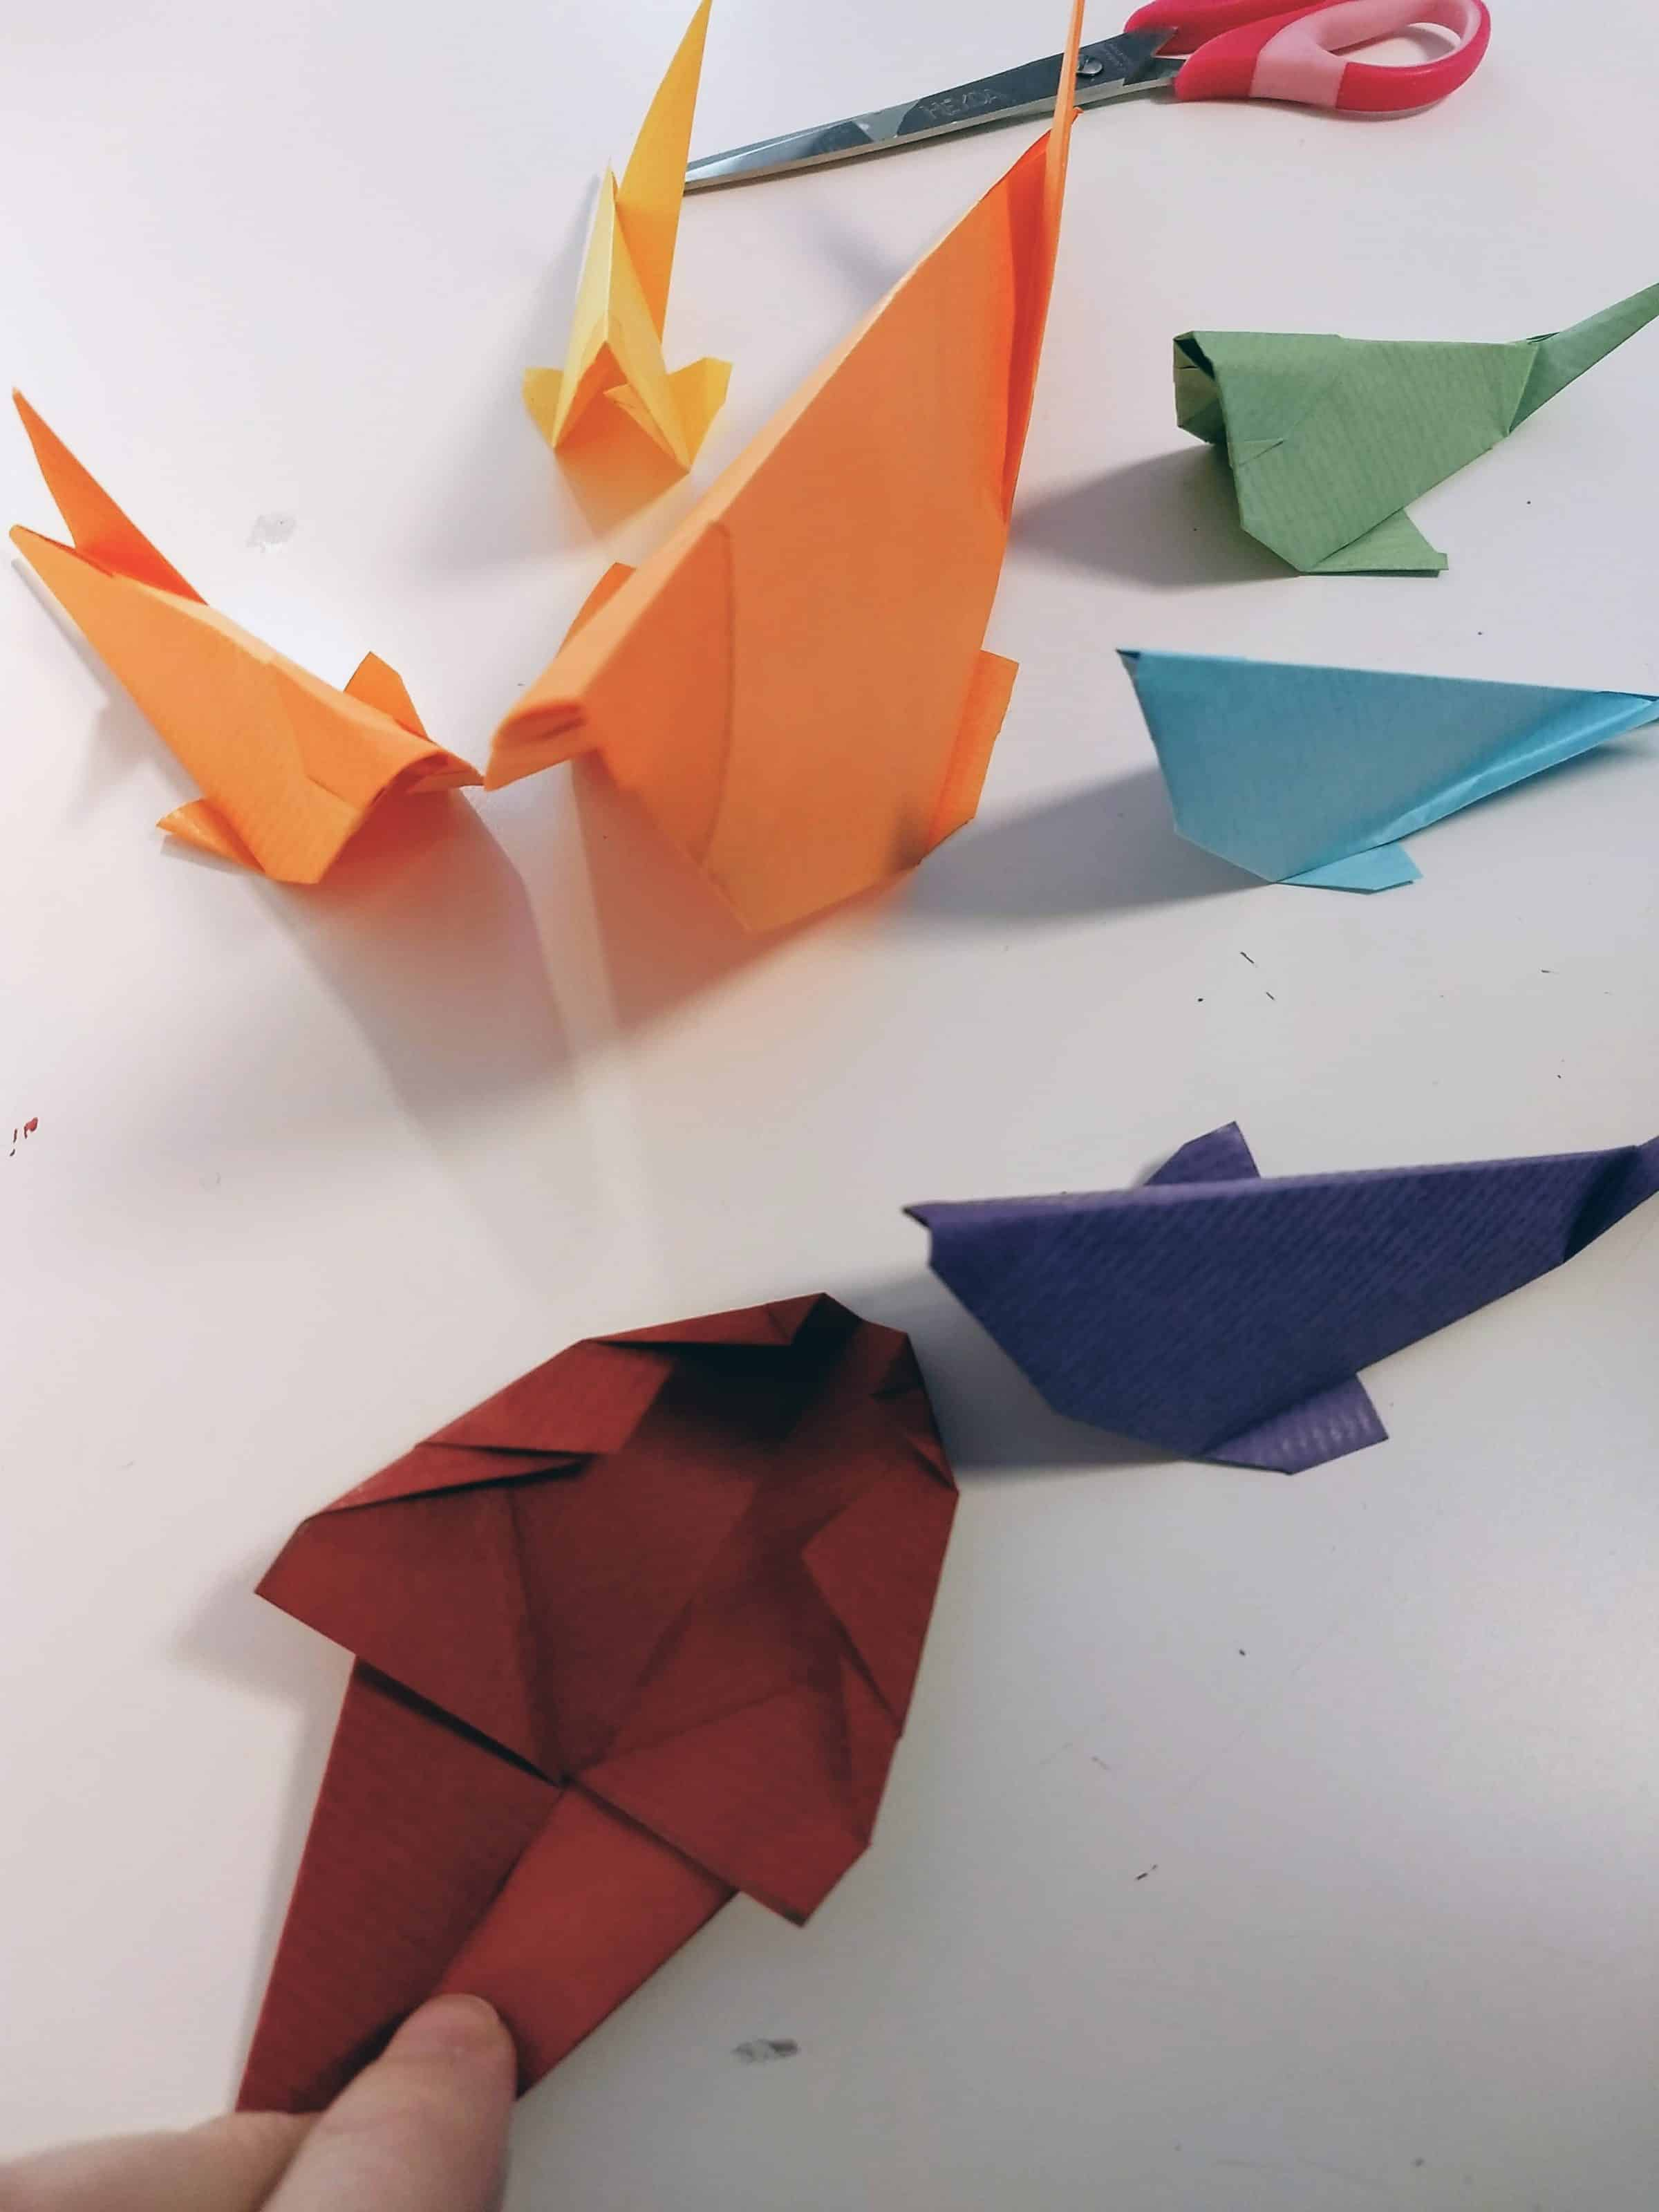 Origami kirigami copyright crapaud-chameau.com